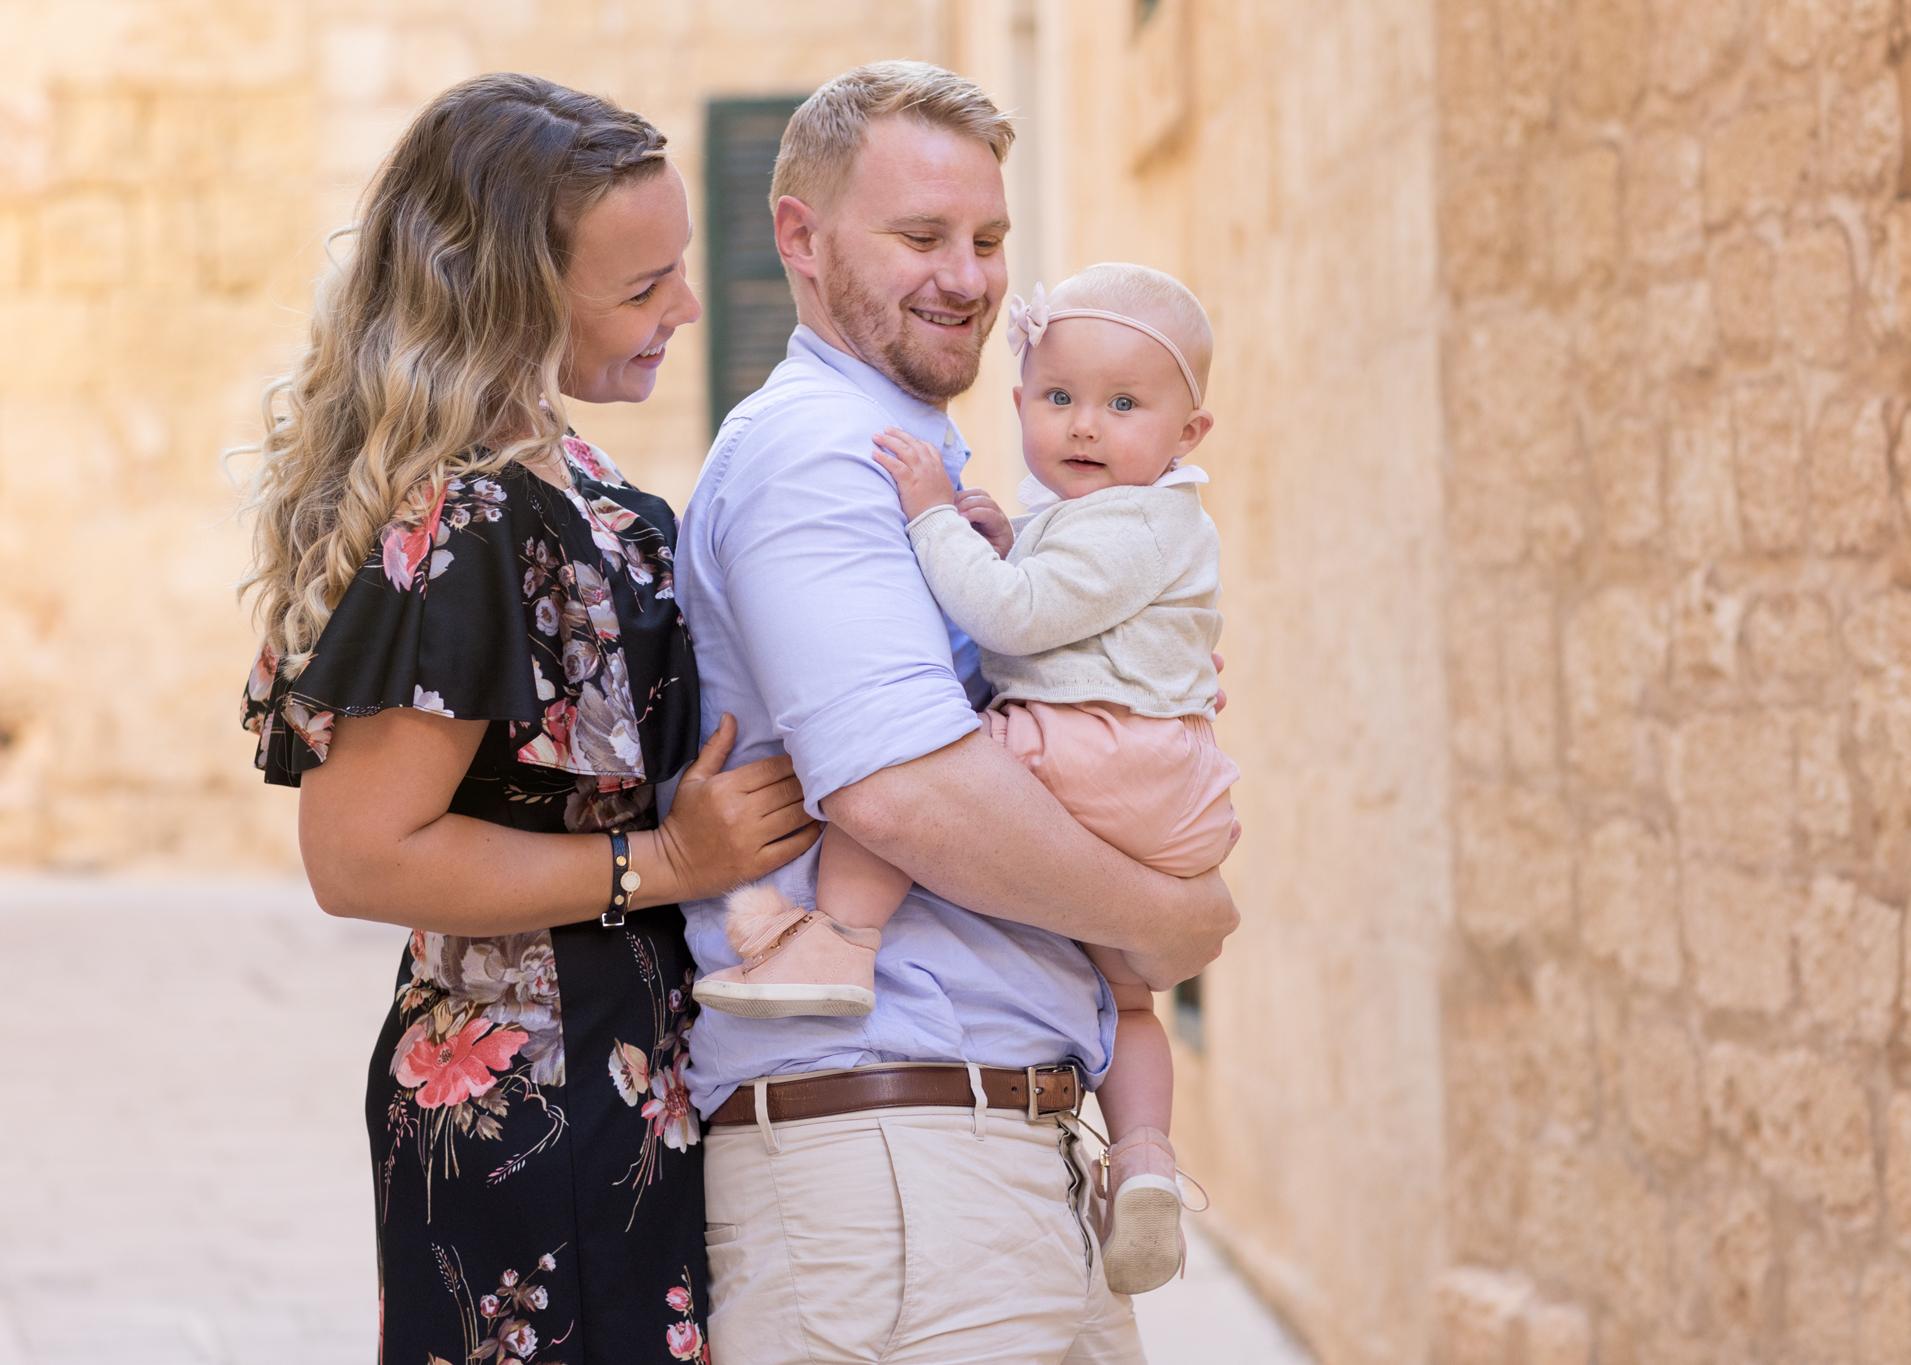 happy family, family photo shoot malta, svensk fotograf malta, portrait photographer malta, best photographer malta, toddler photo shoot